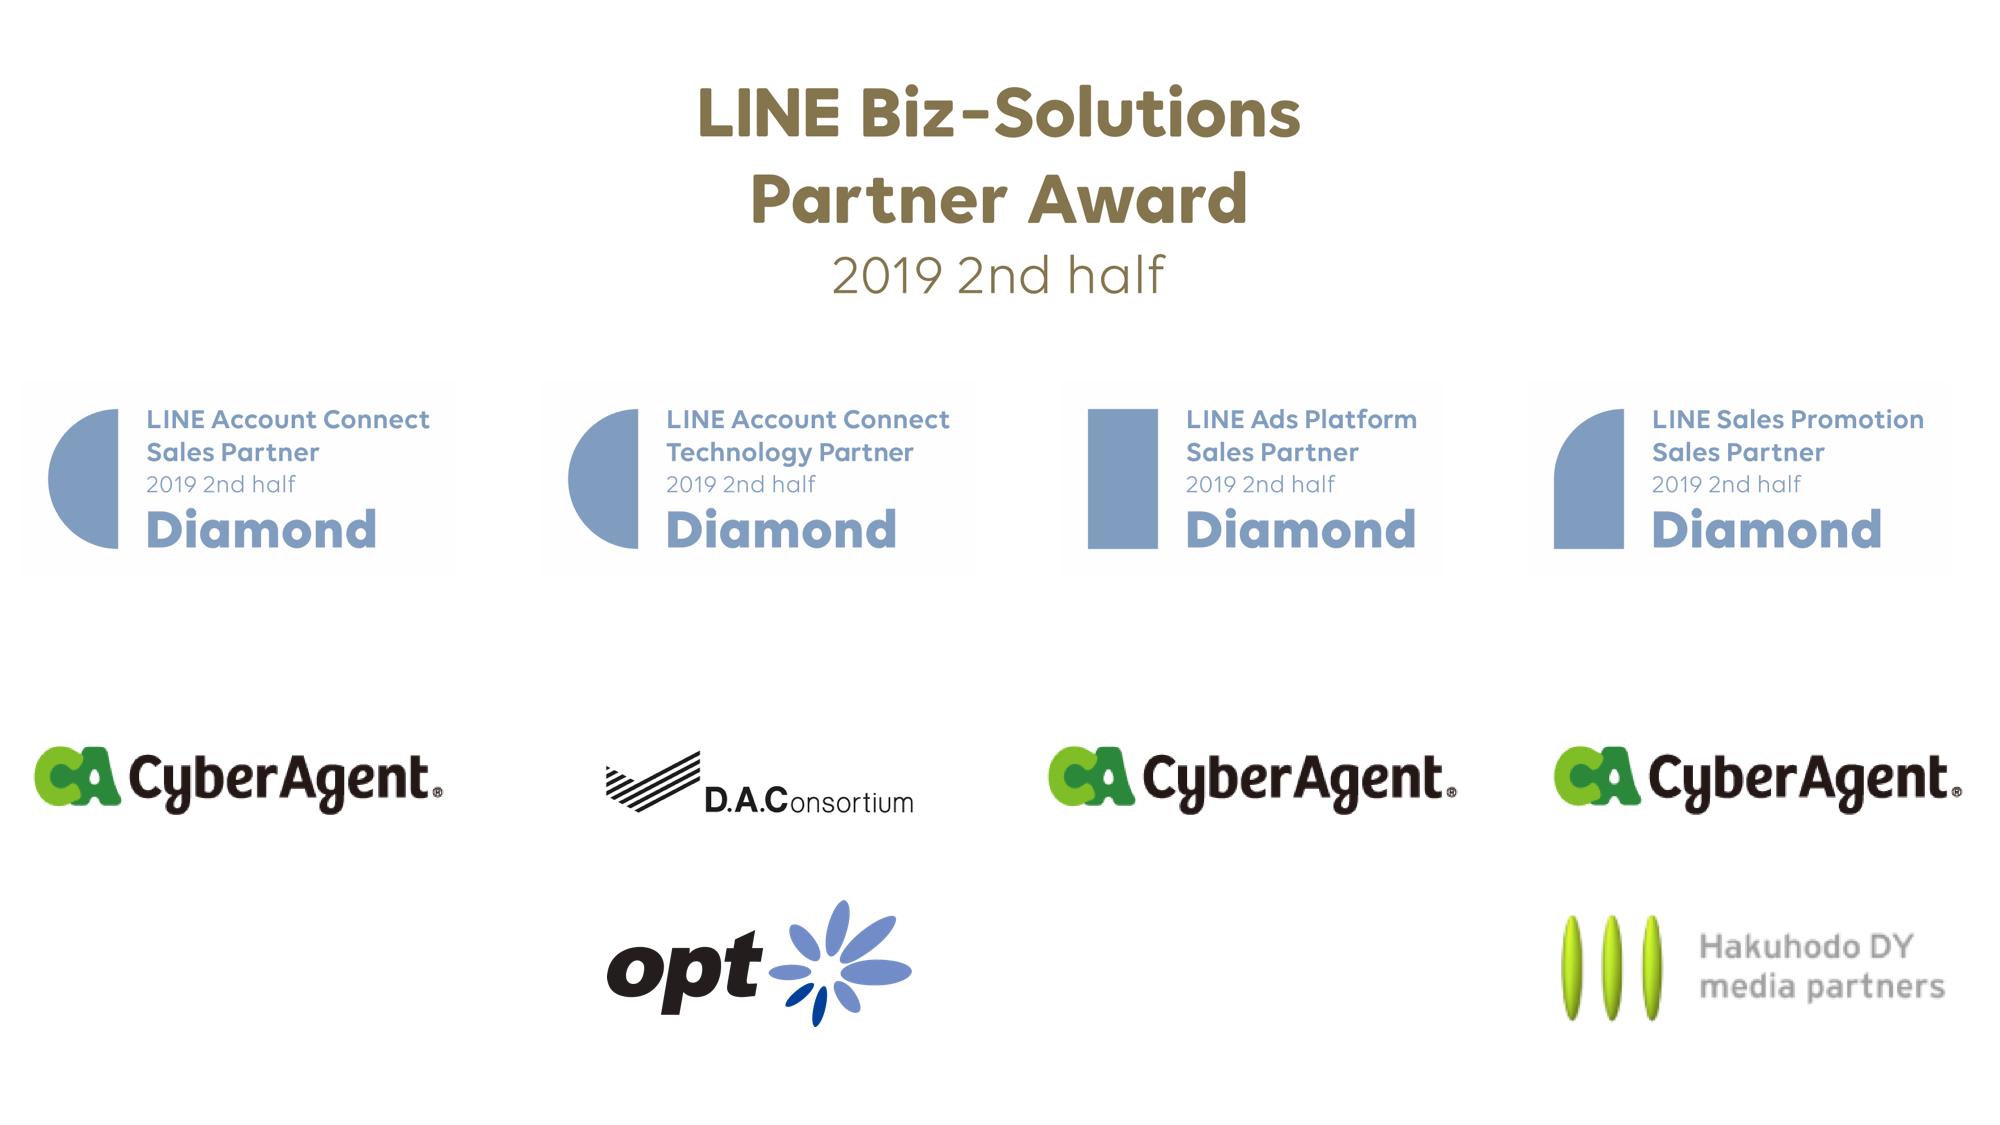 /stf/linecorp/ja/pr/partneraward20192nd.png